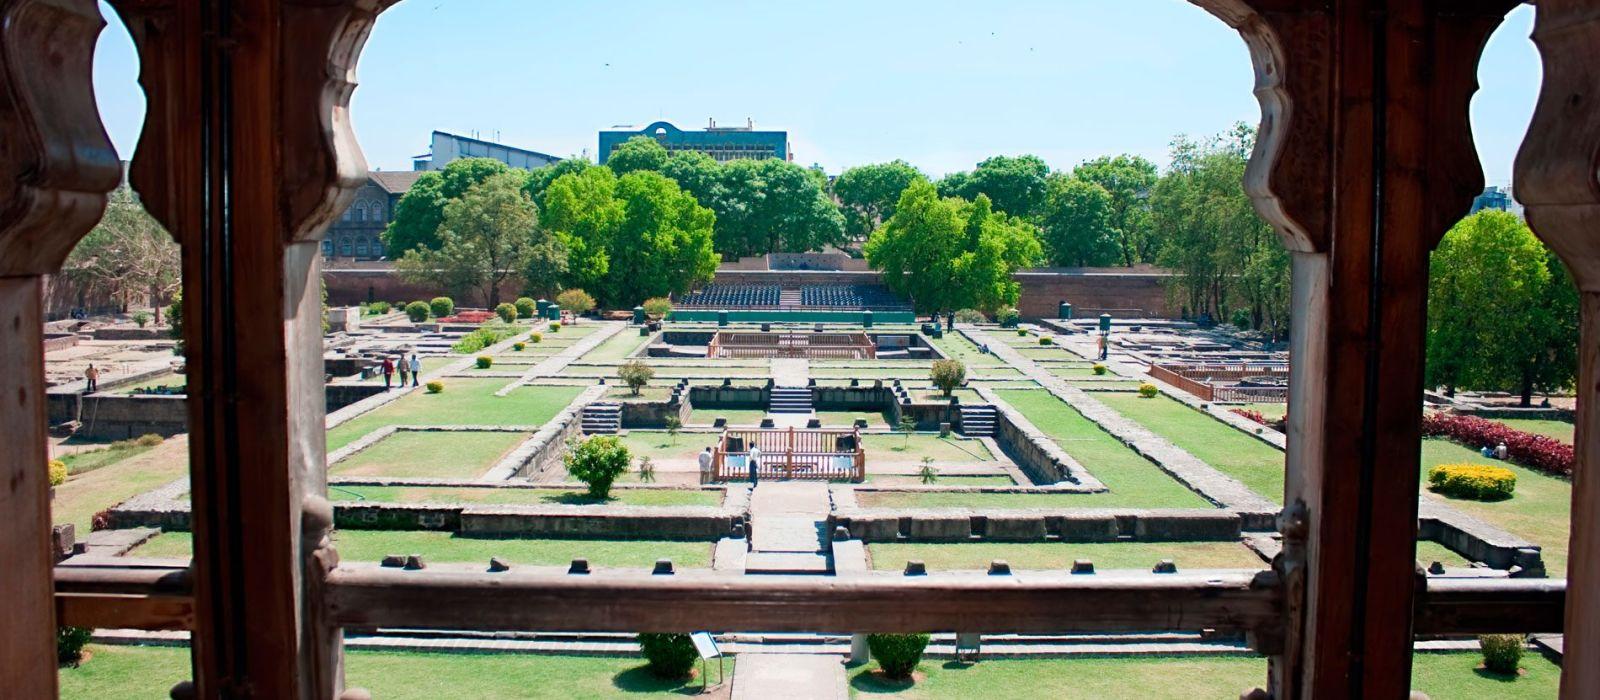 Reiseziel Pune Zentral- & Westindien